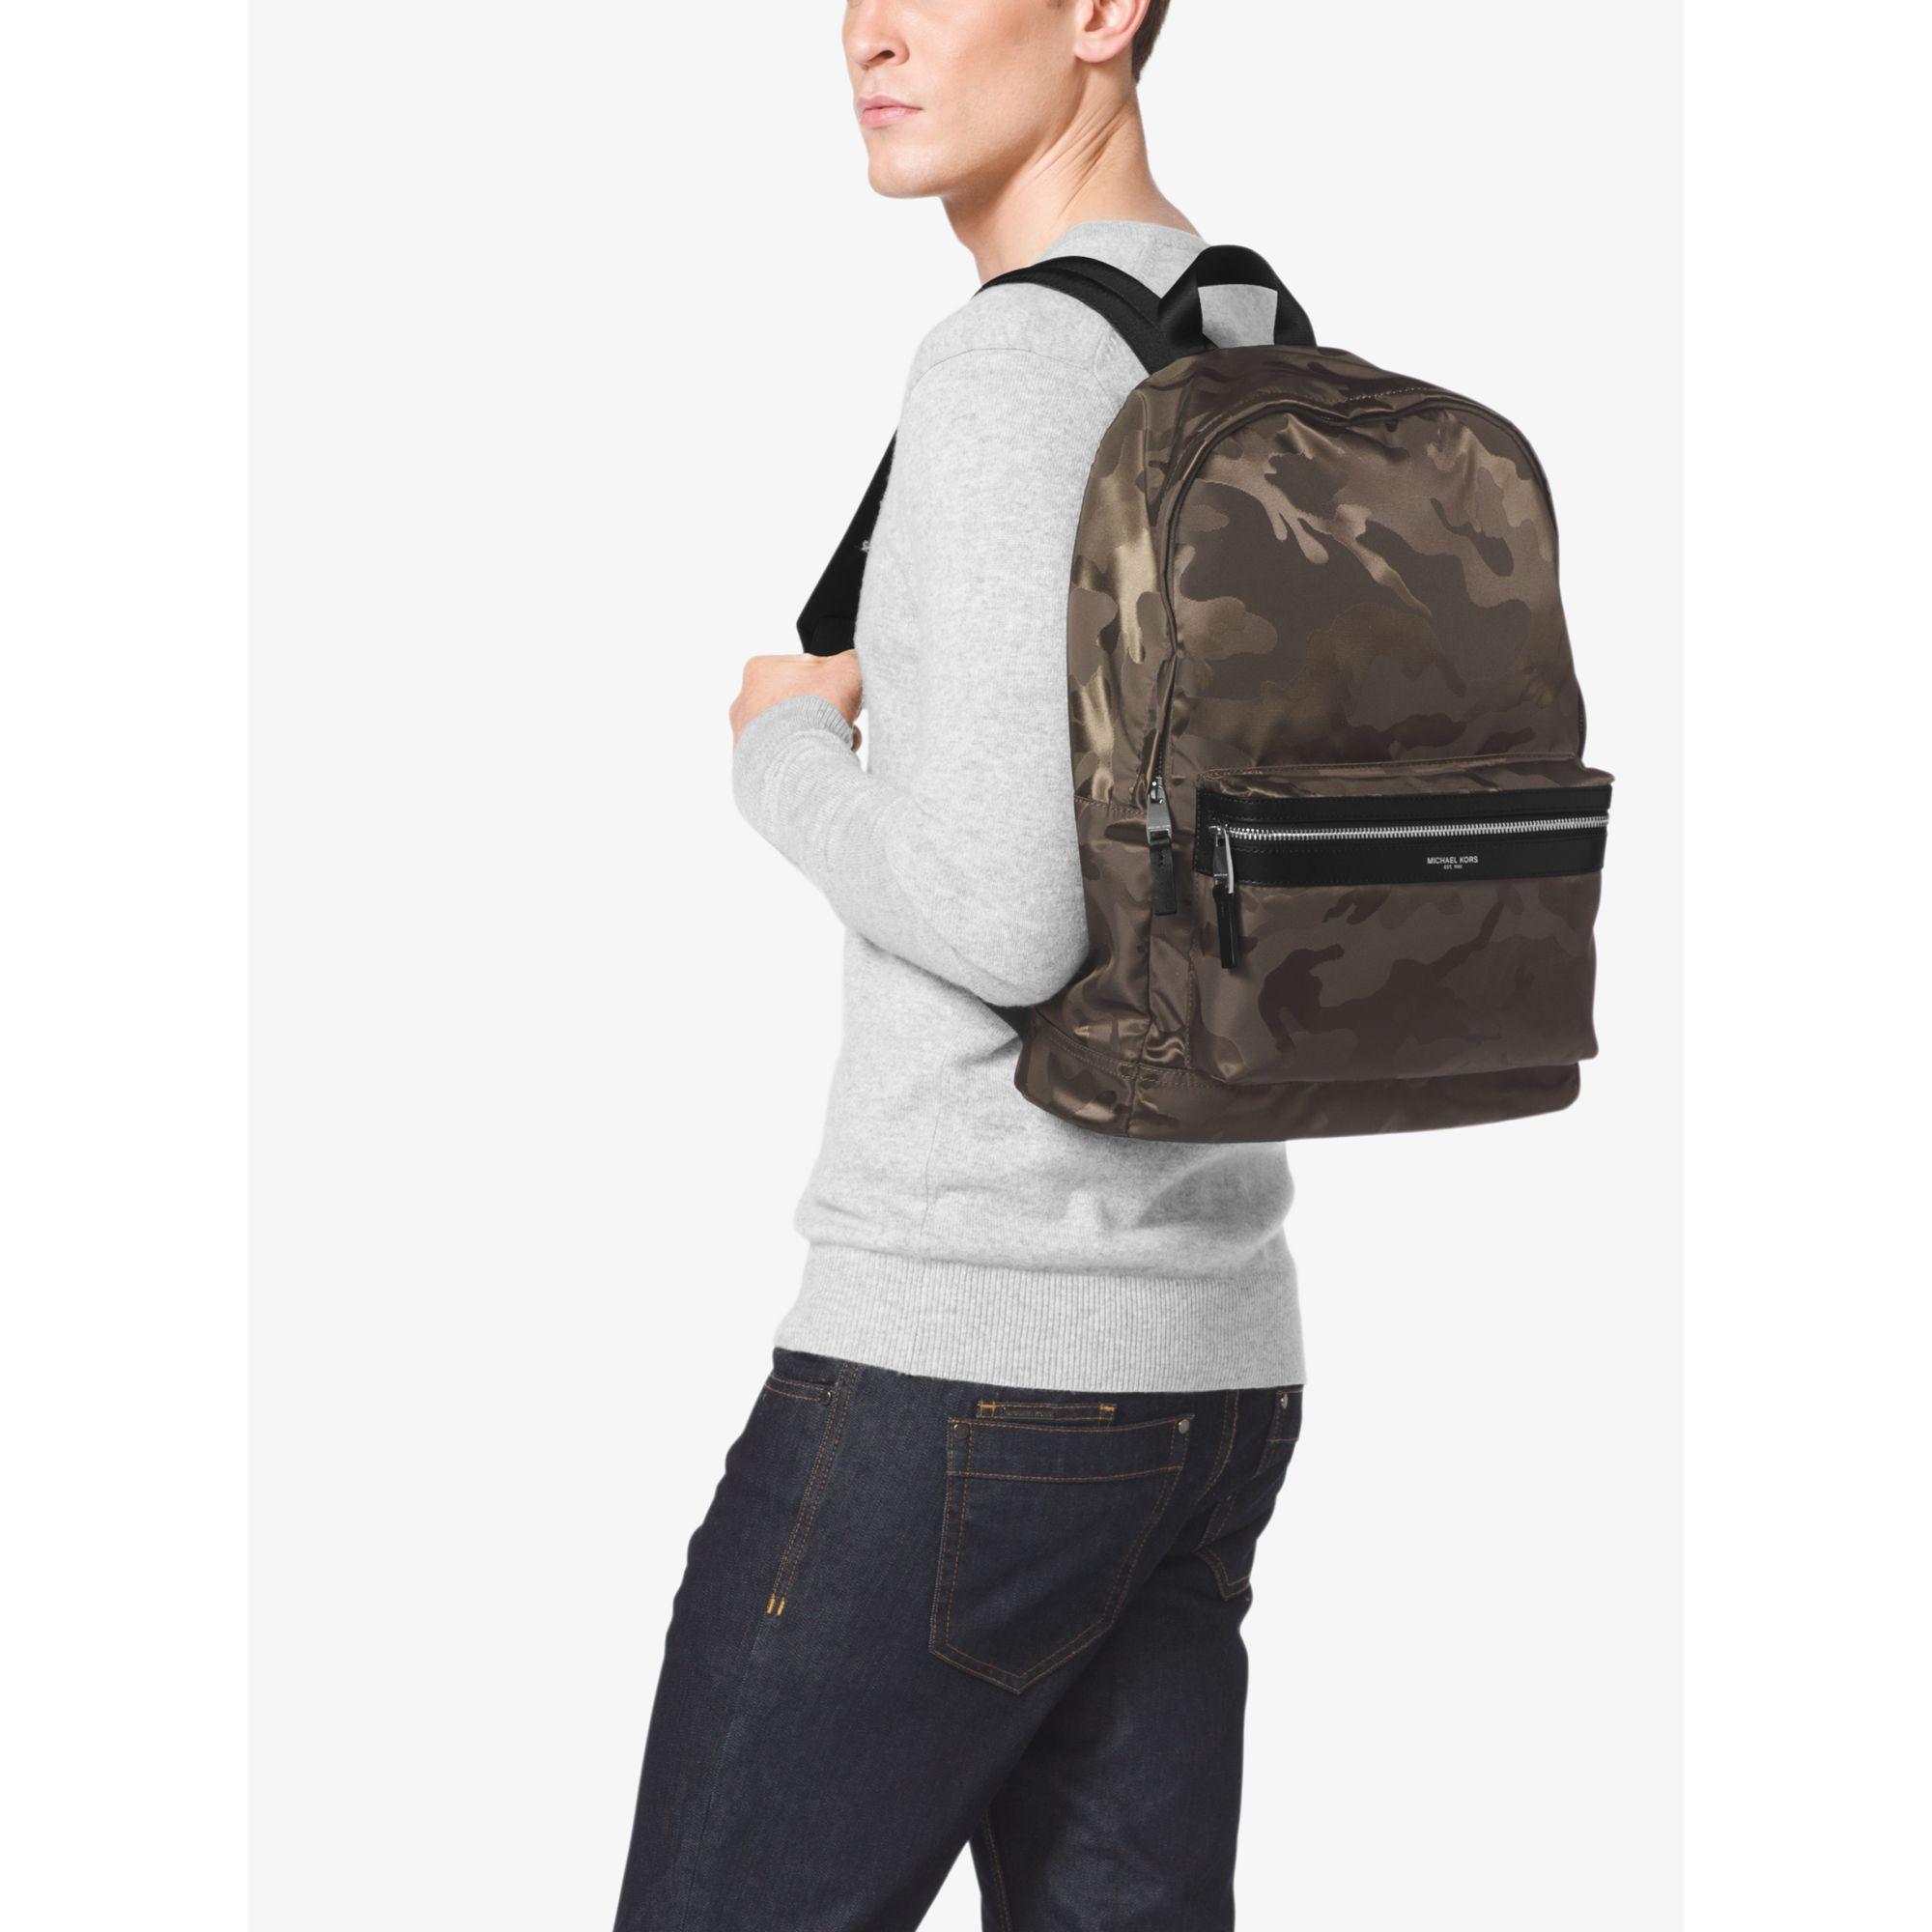 c4b6eb52b32e34 Michael Kors Kent Camouflage Nylon Jacquard Backpack in Green for ...